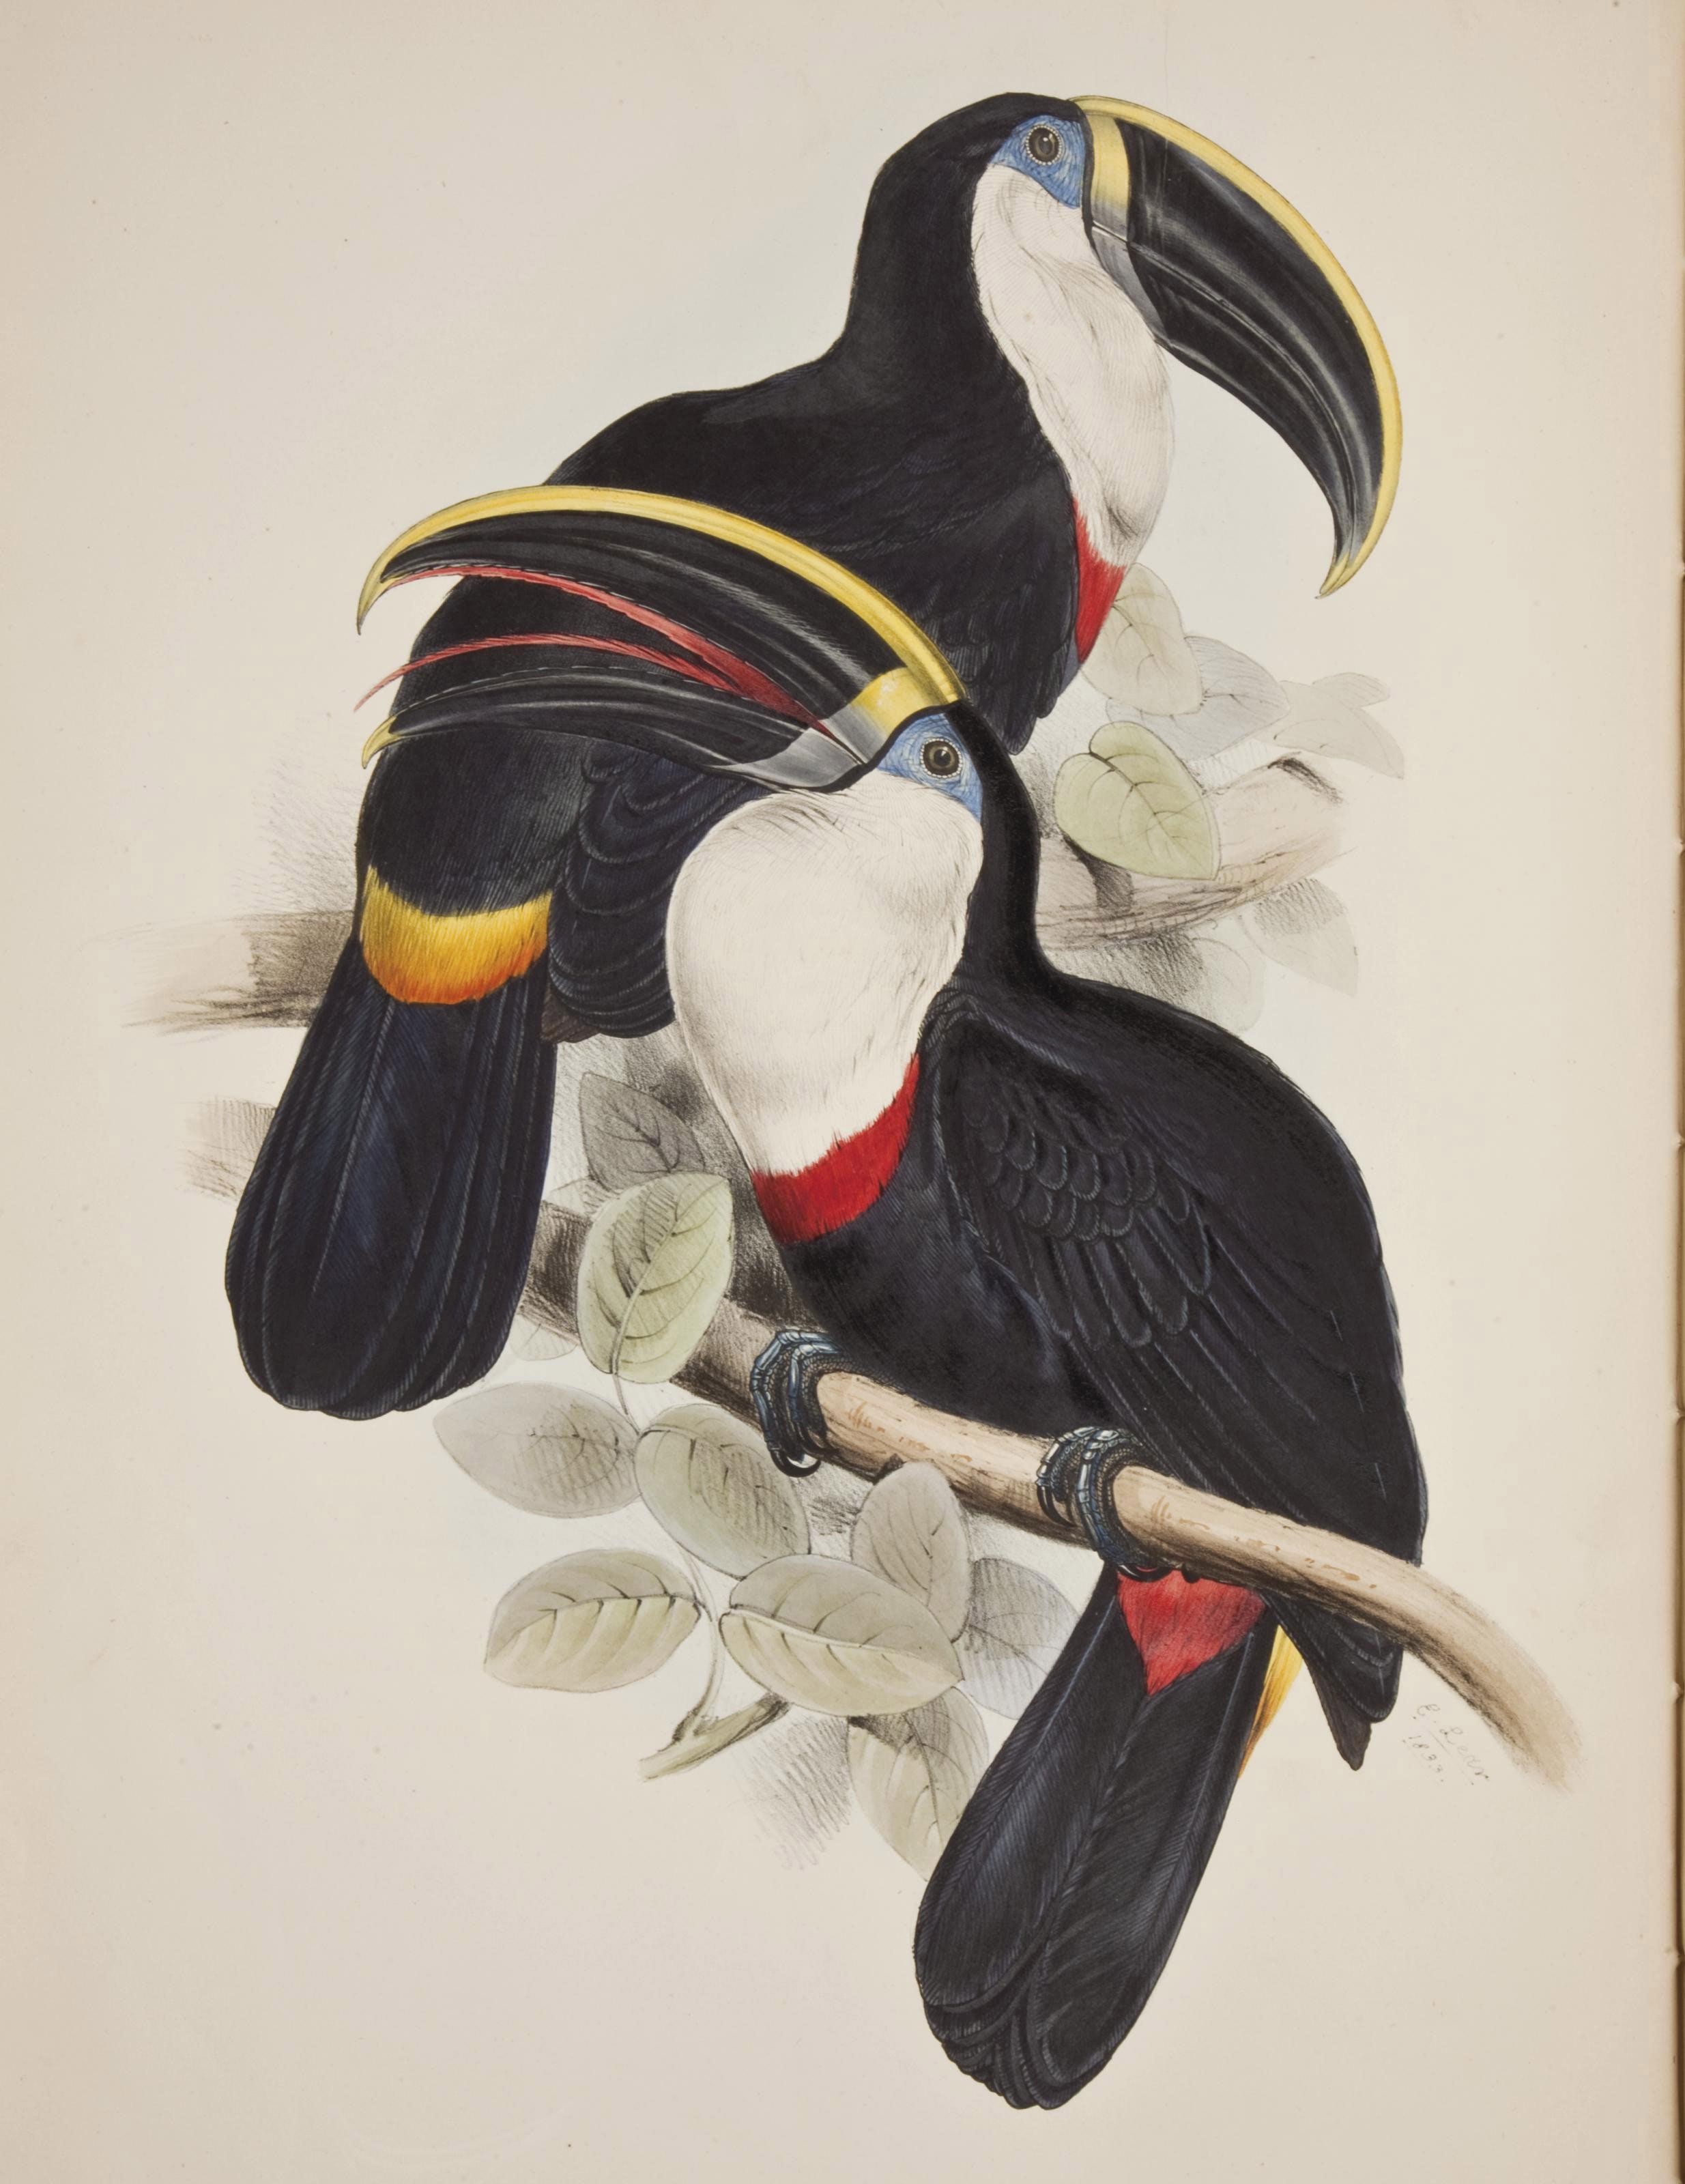 GOULD, John (1804-1881). A Monograph of the Ramphastidae, or Family of Toucans. Londres: pour l'auteur, [1833-] 1834.